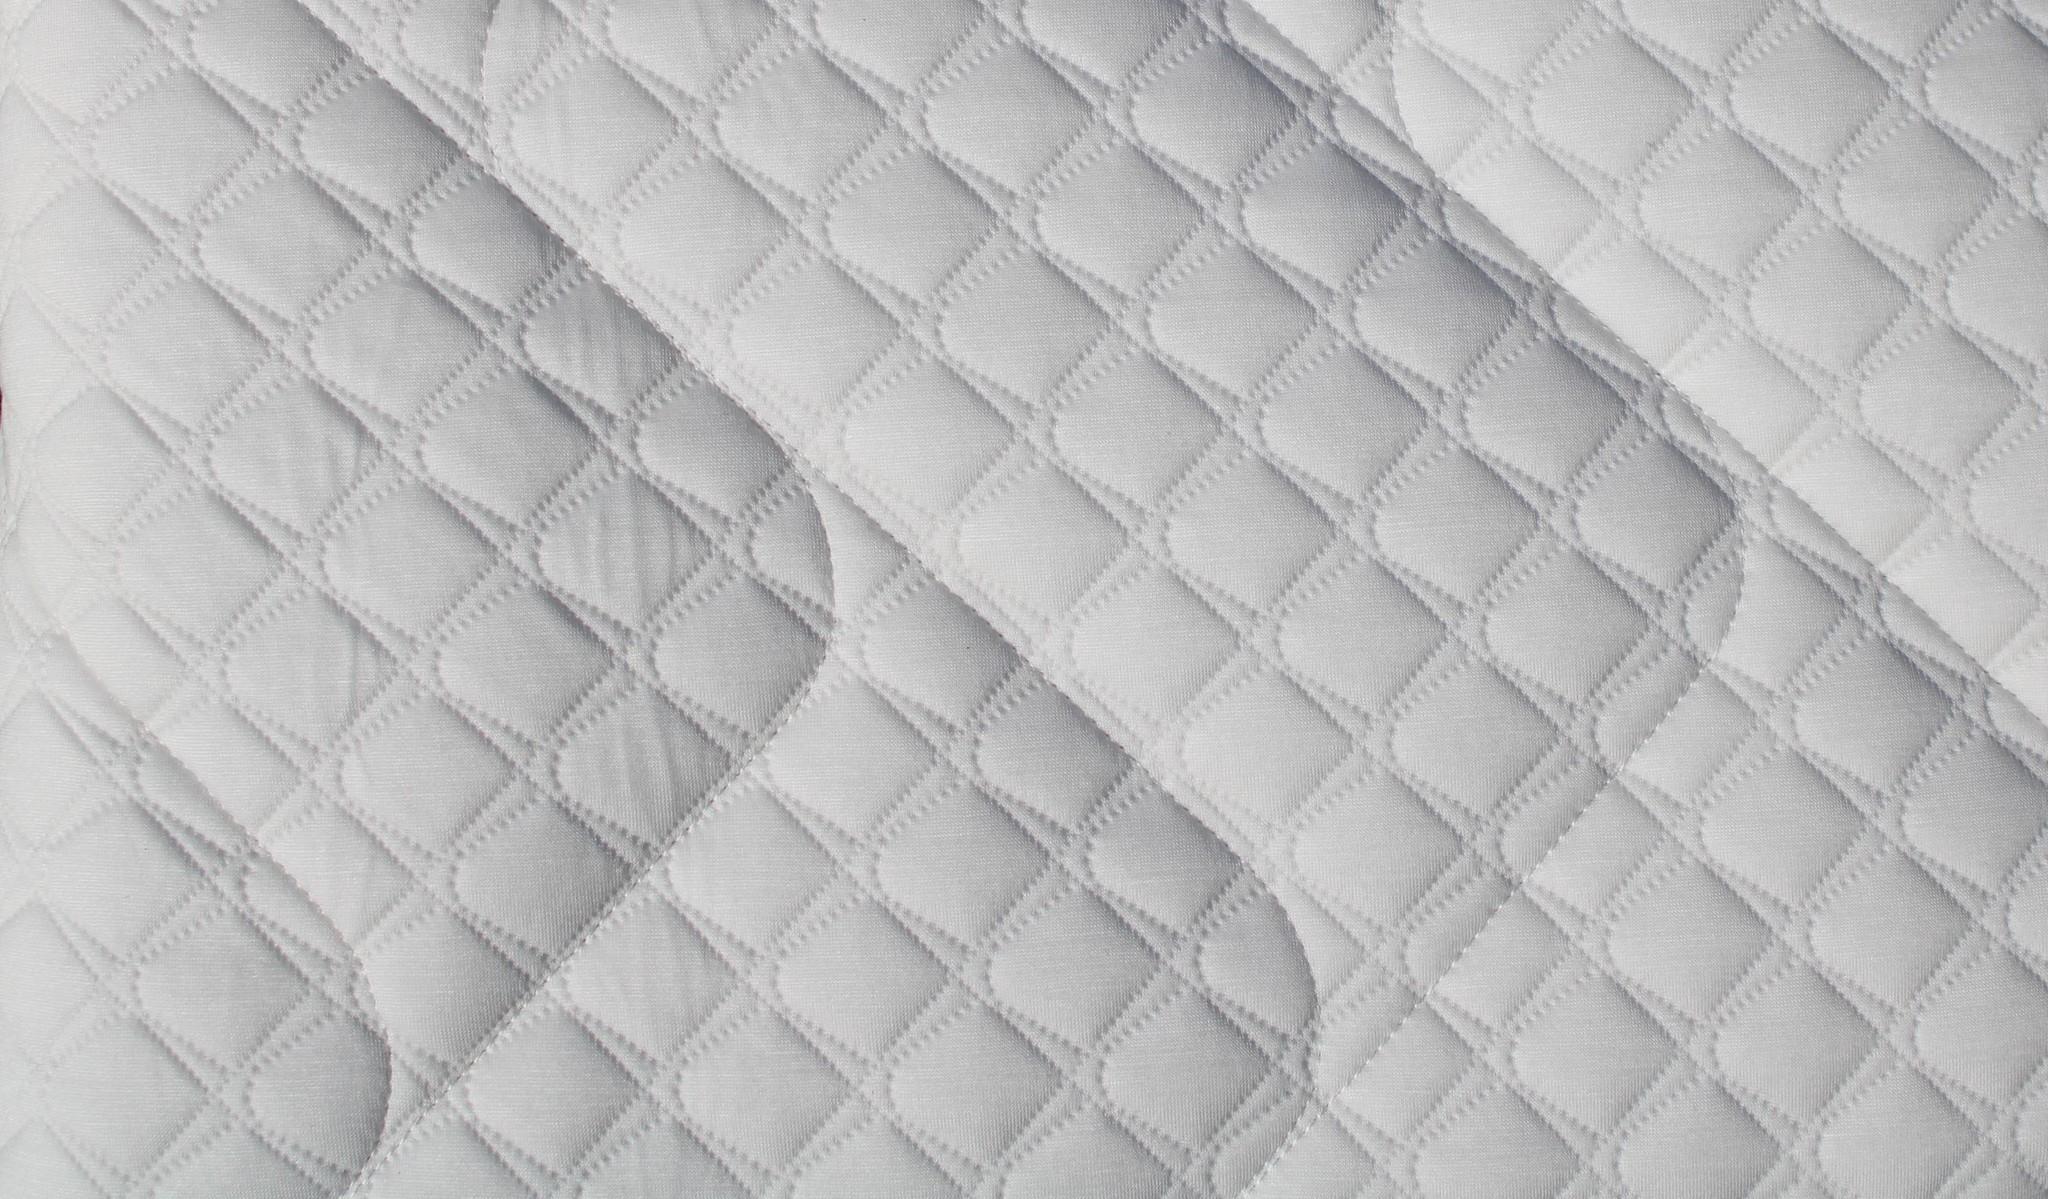 Sarpy Kindermatras 90x190 Sertel Tailor Made Mattress